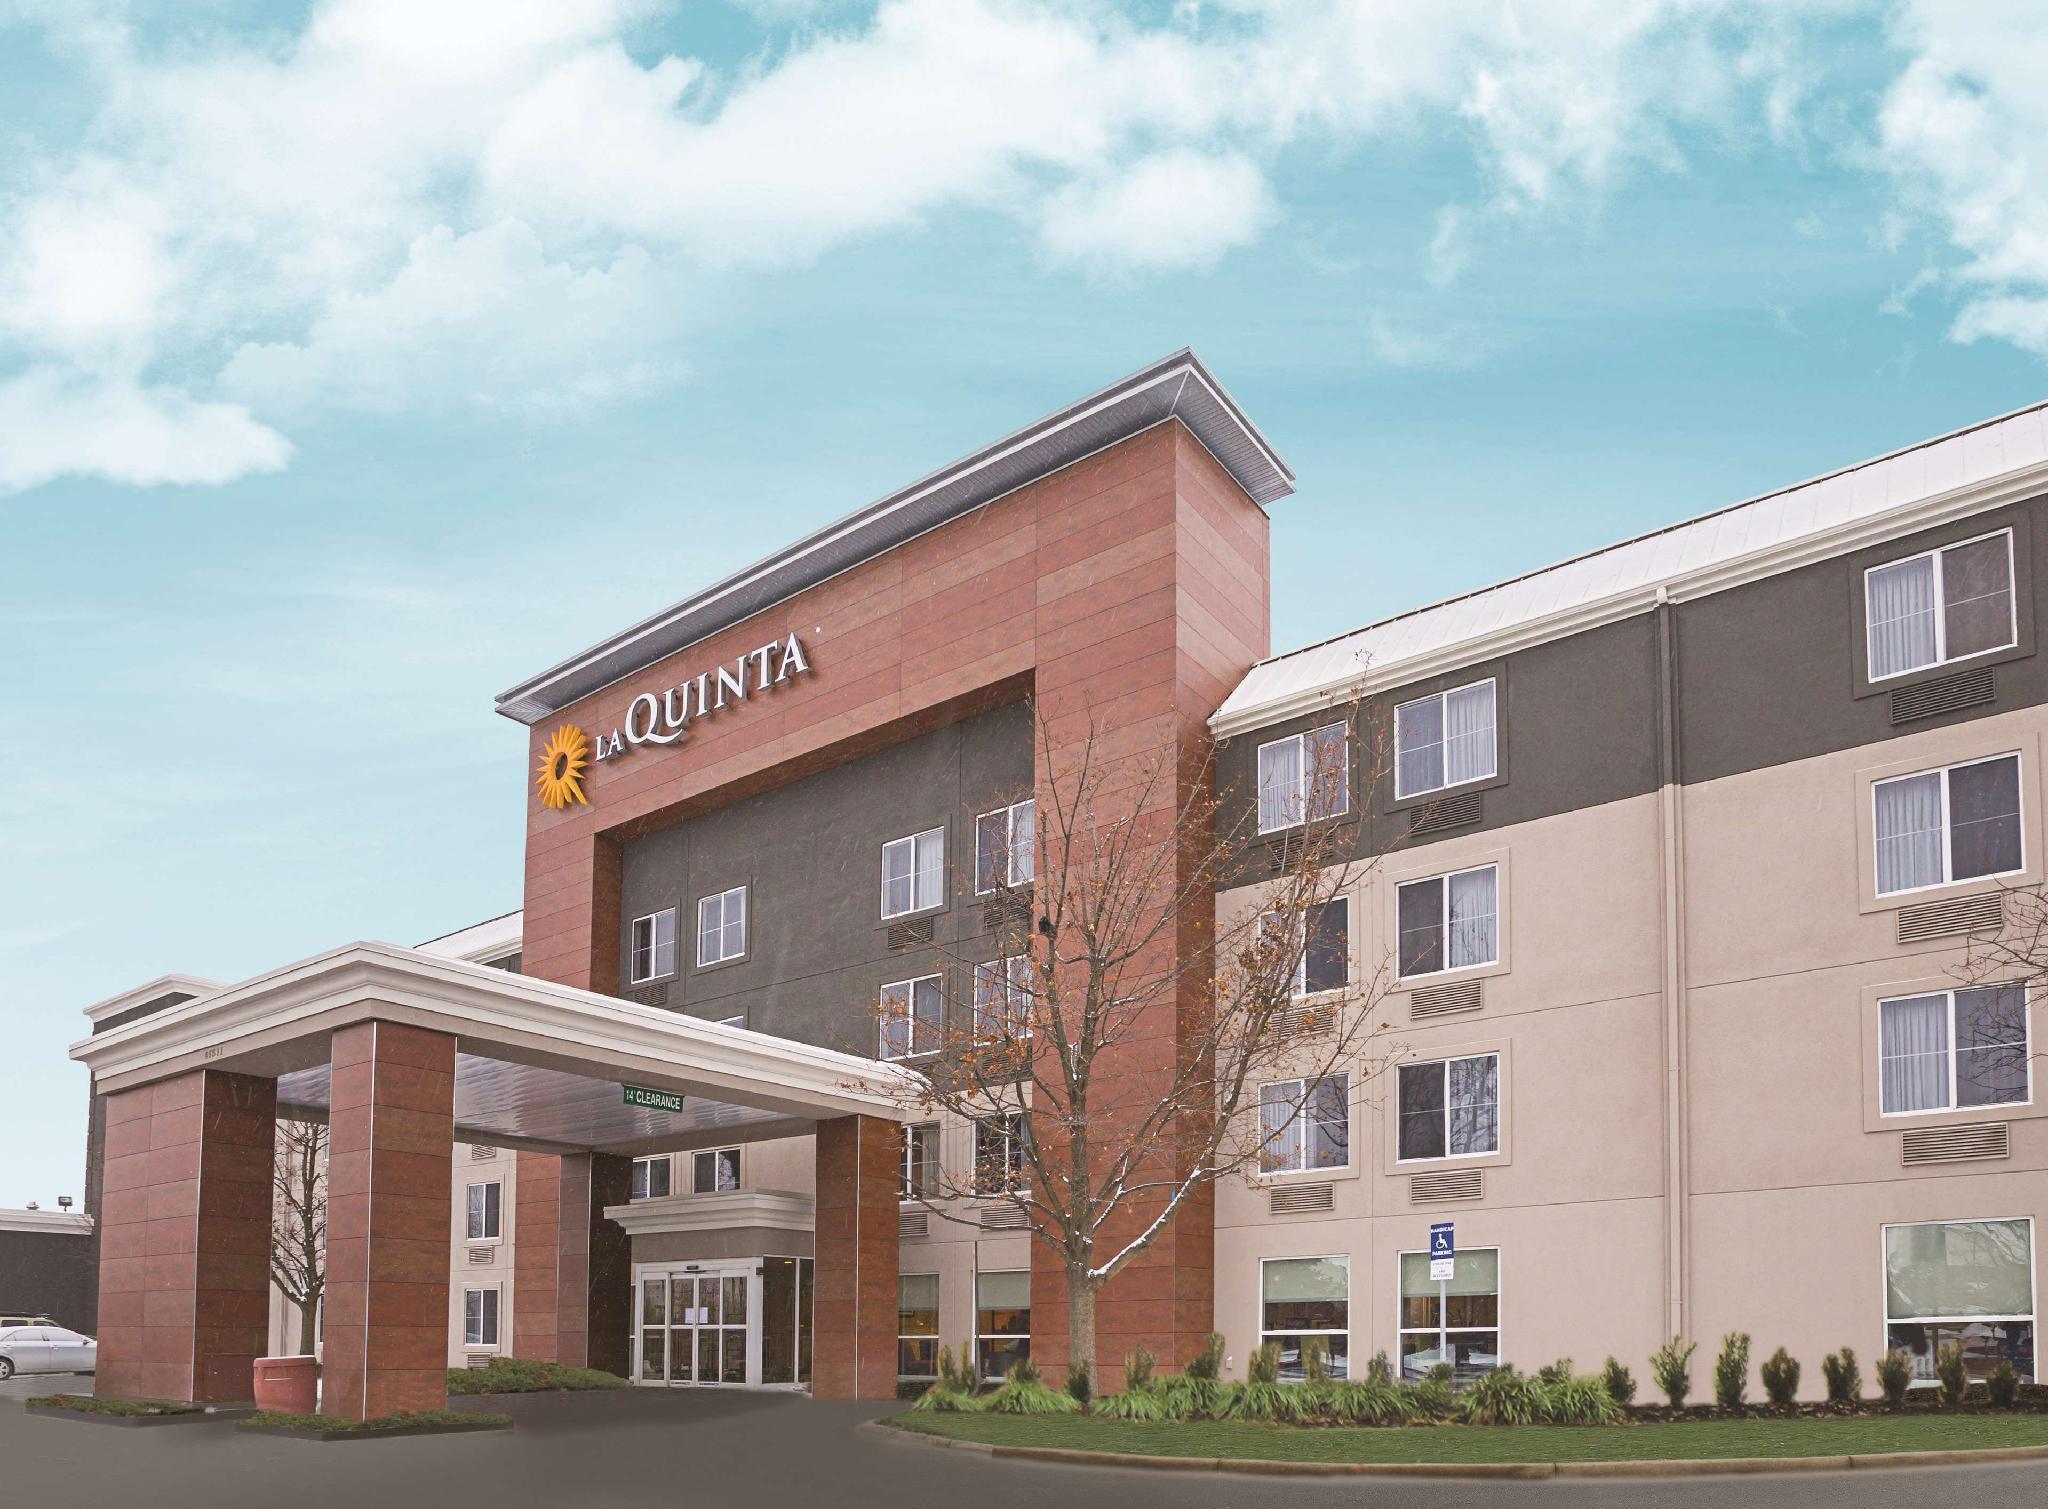 La Quinta Inn And Suites By Wyndham Detroit Utica